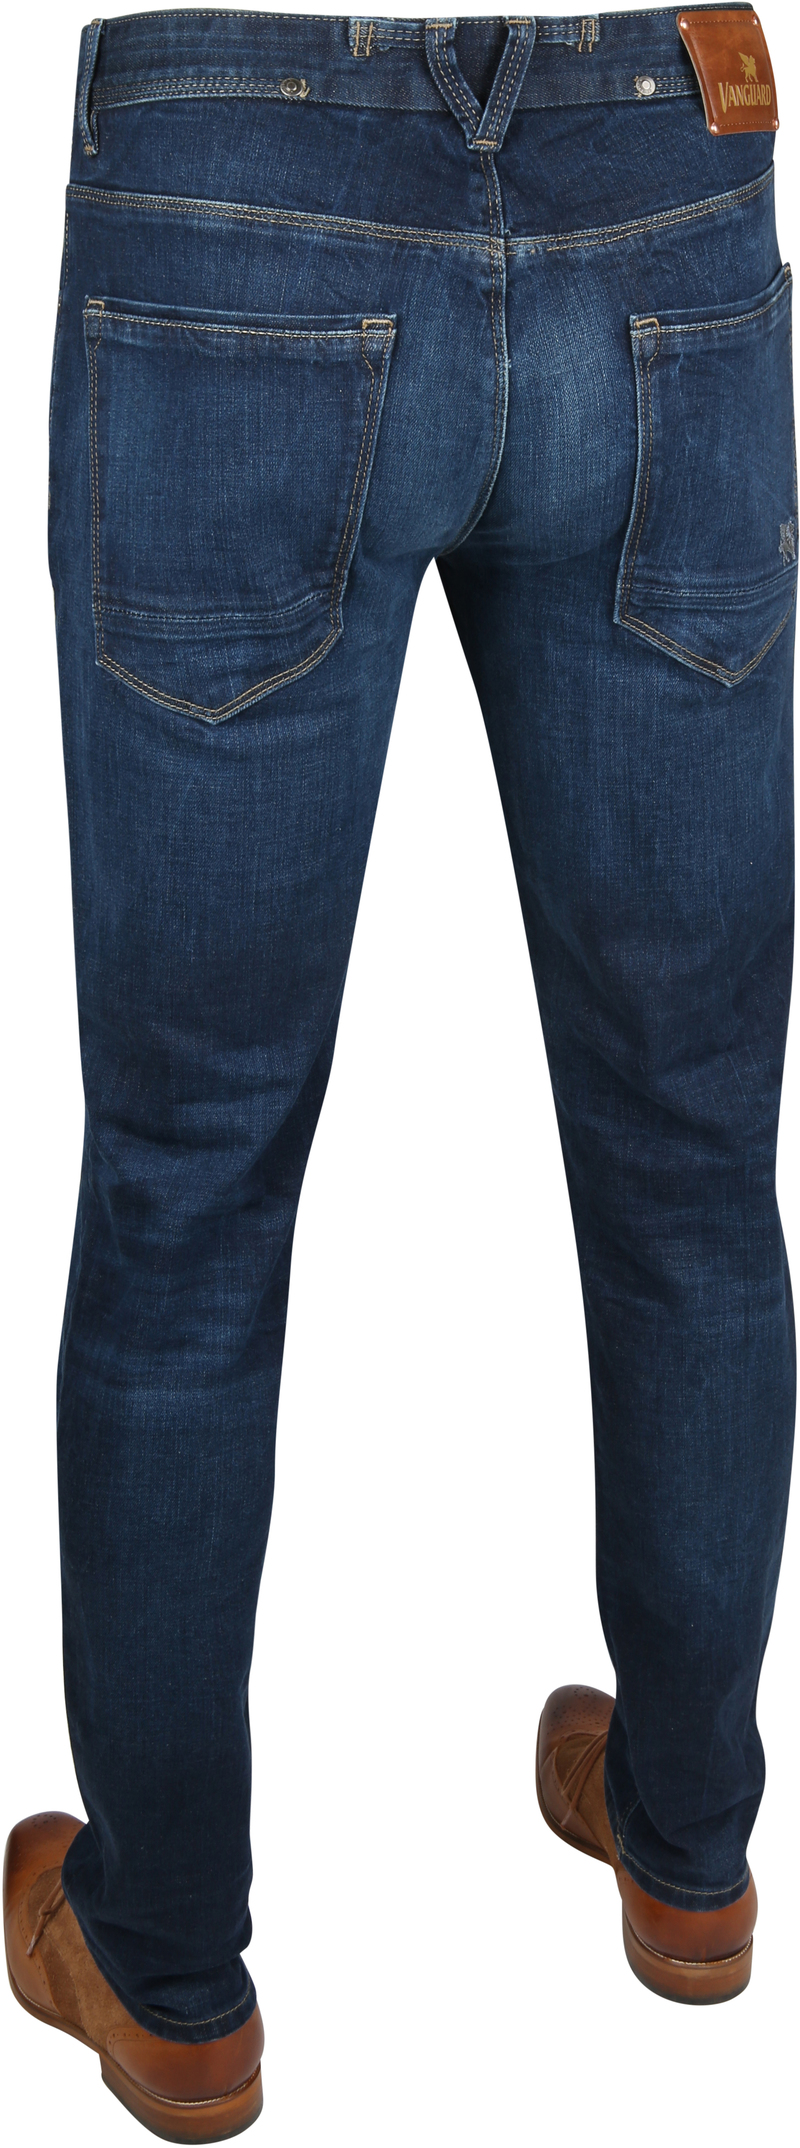 Vanguard Jeans V7 Rider Pure Blue photo 2